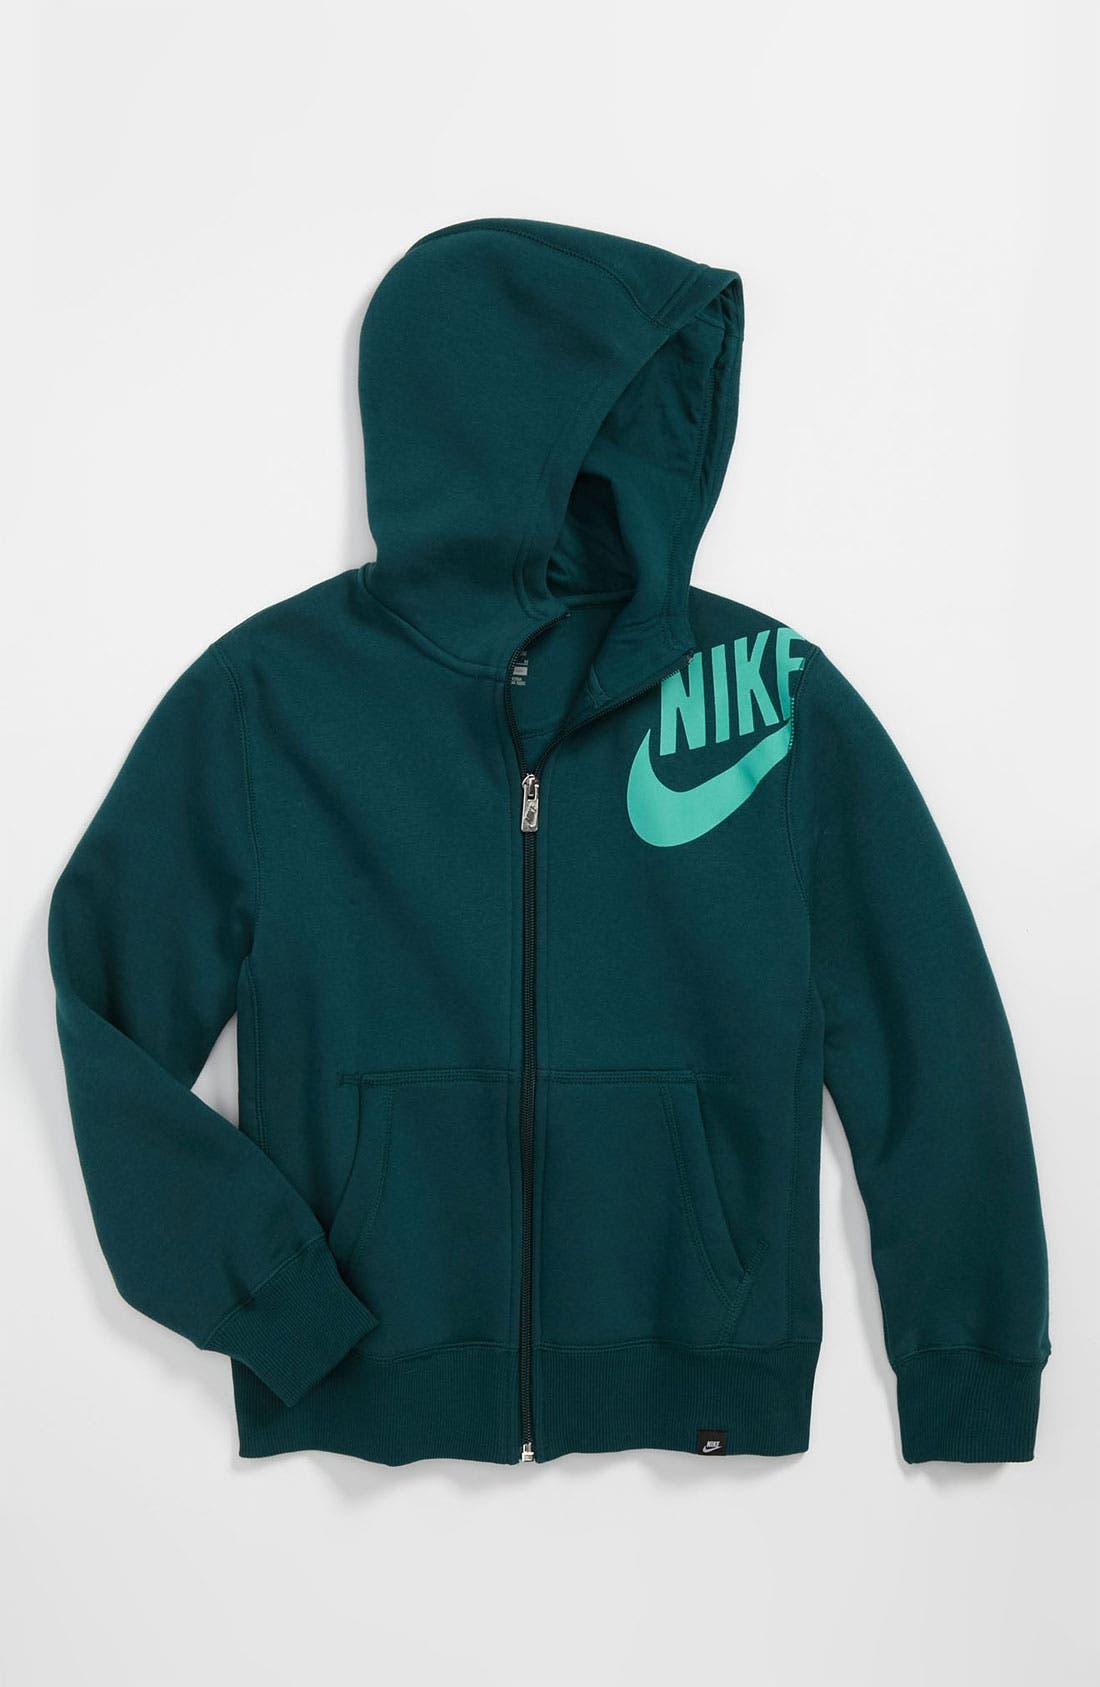 Main Image - Nike 'Limitless' Hoodie (Big Boys)